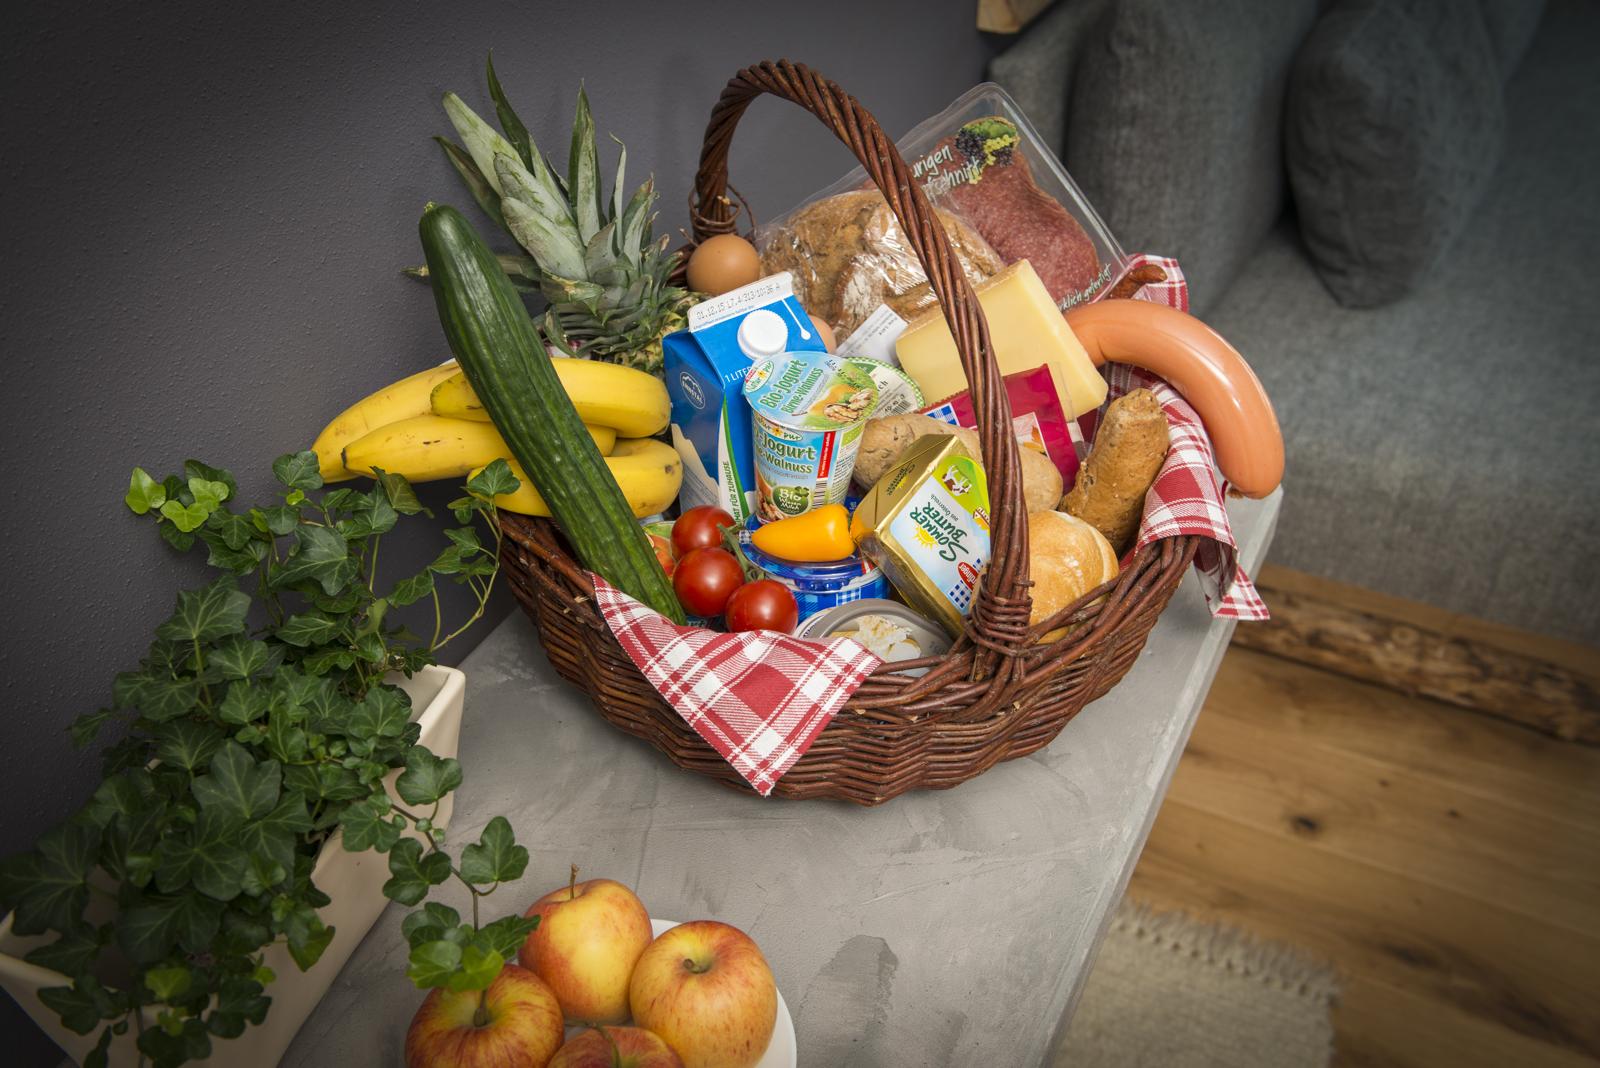 Bioprodukte, Frühstückskorb, Urlaub